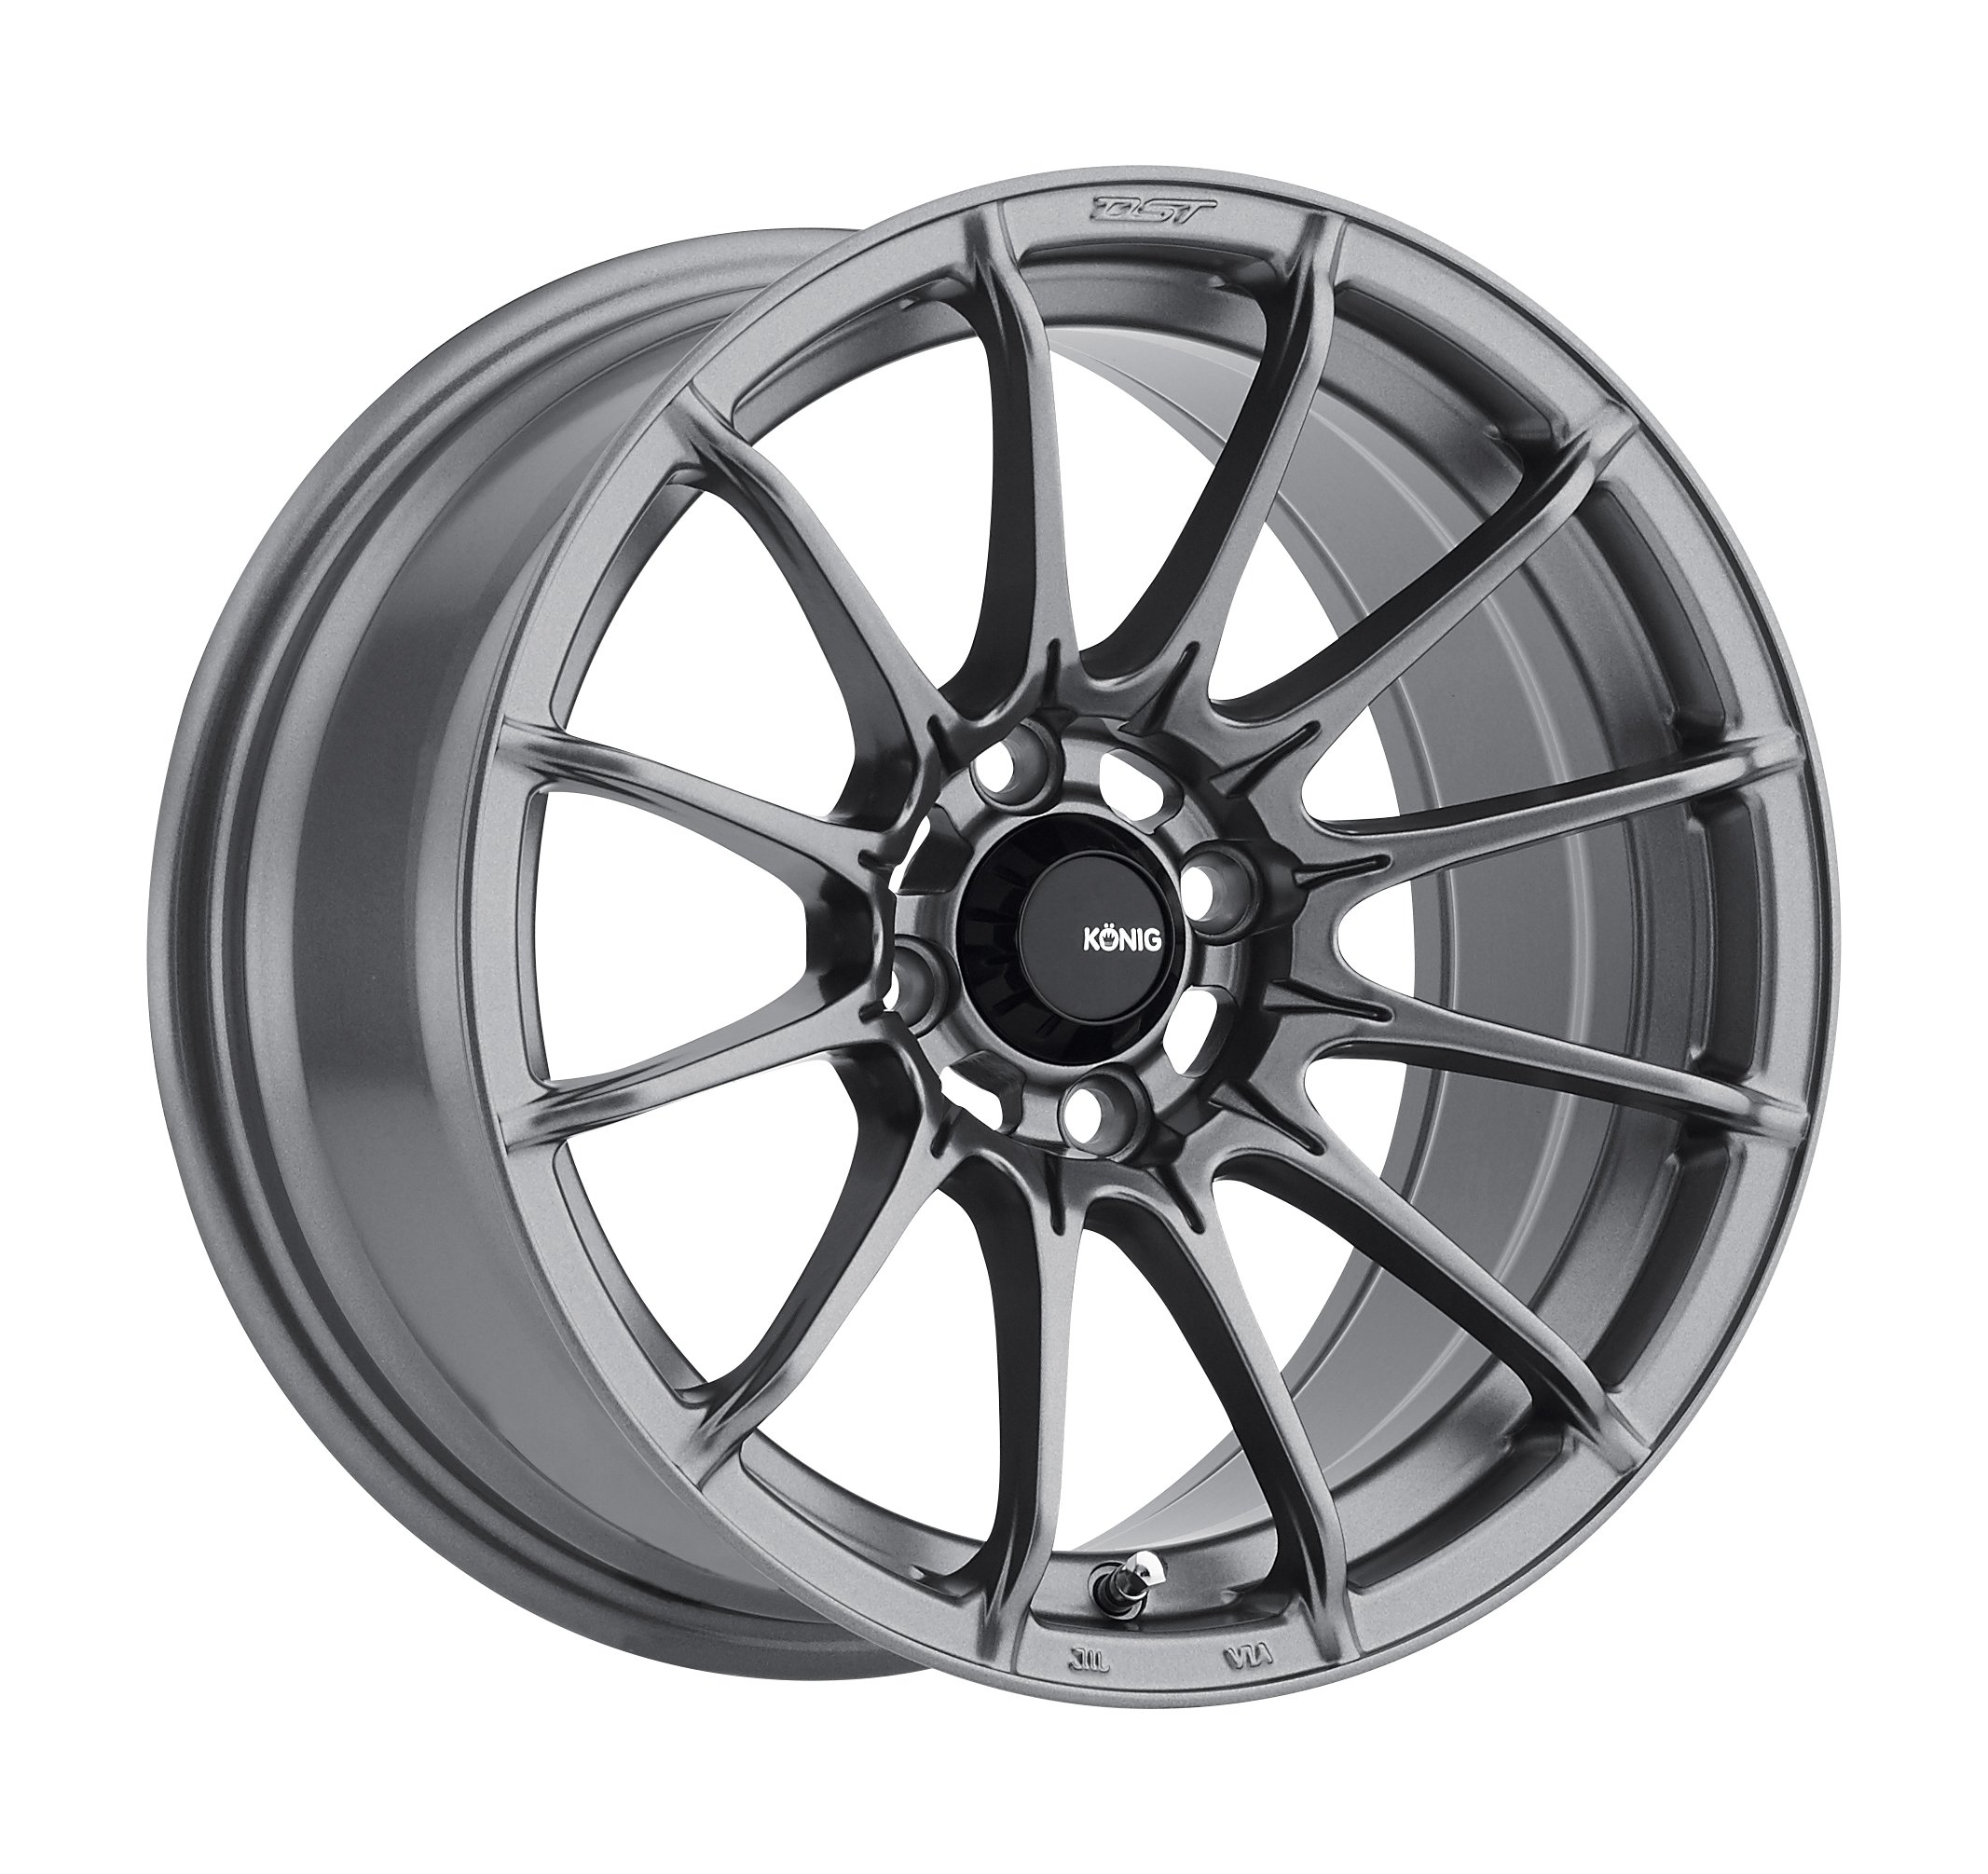 Konig-DIAL-IN-Matte-Grey-Wheel-15x84x100mm-25mm-offset